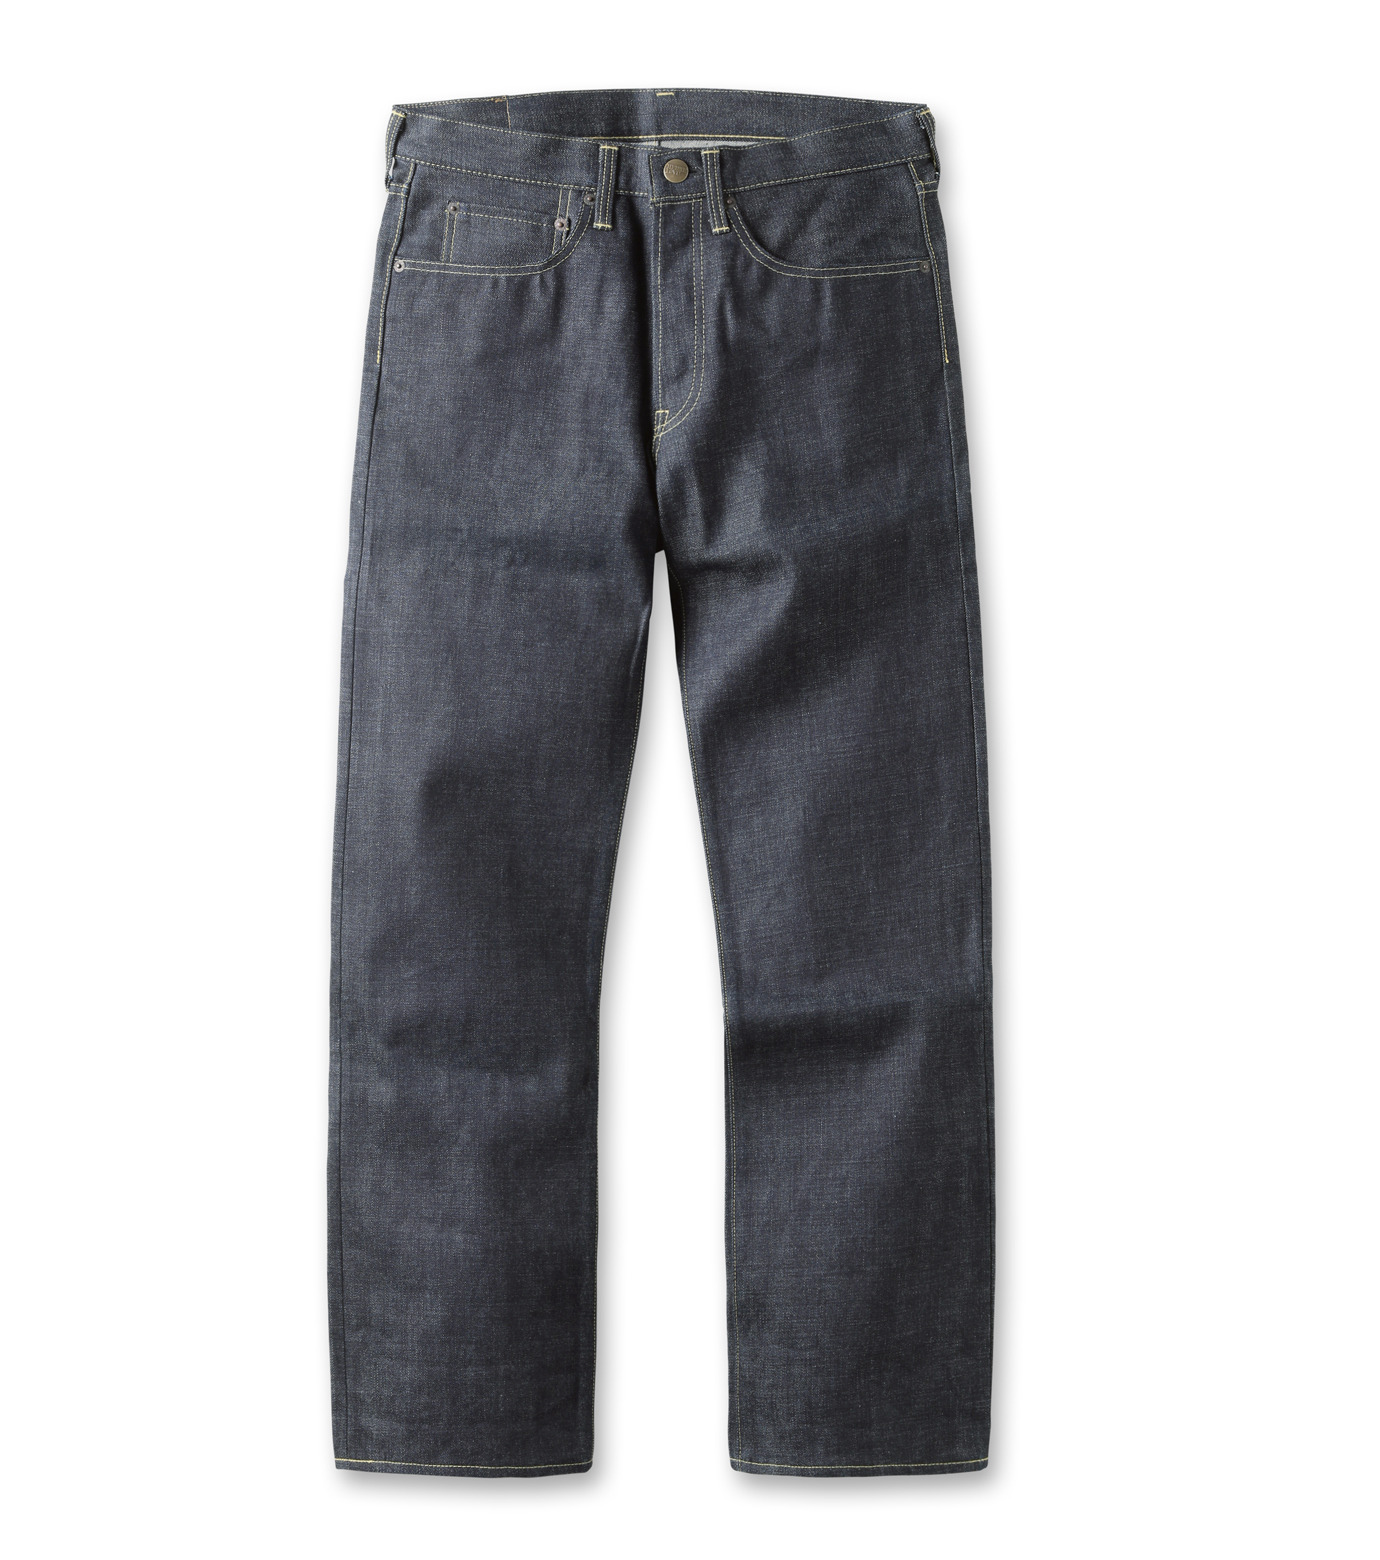 Heddie Lovu(エディー ルーヴ)のSPRUCE-NWS-INDIGO(パンツ/pants)-SPR-NWS-94 拡大詳細画像1